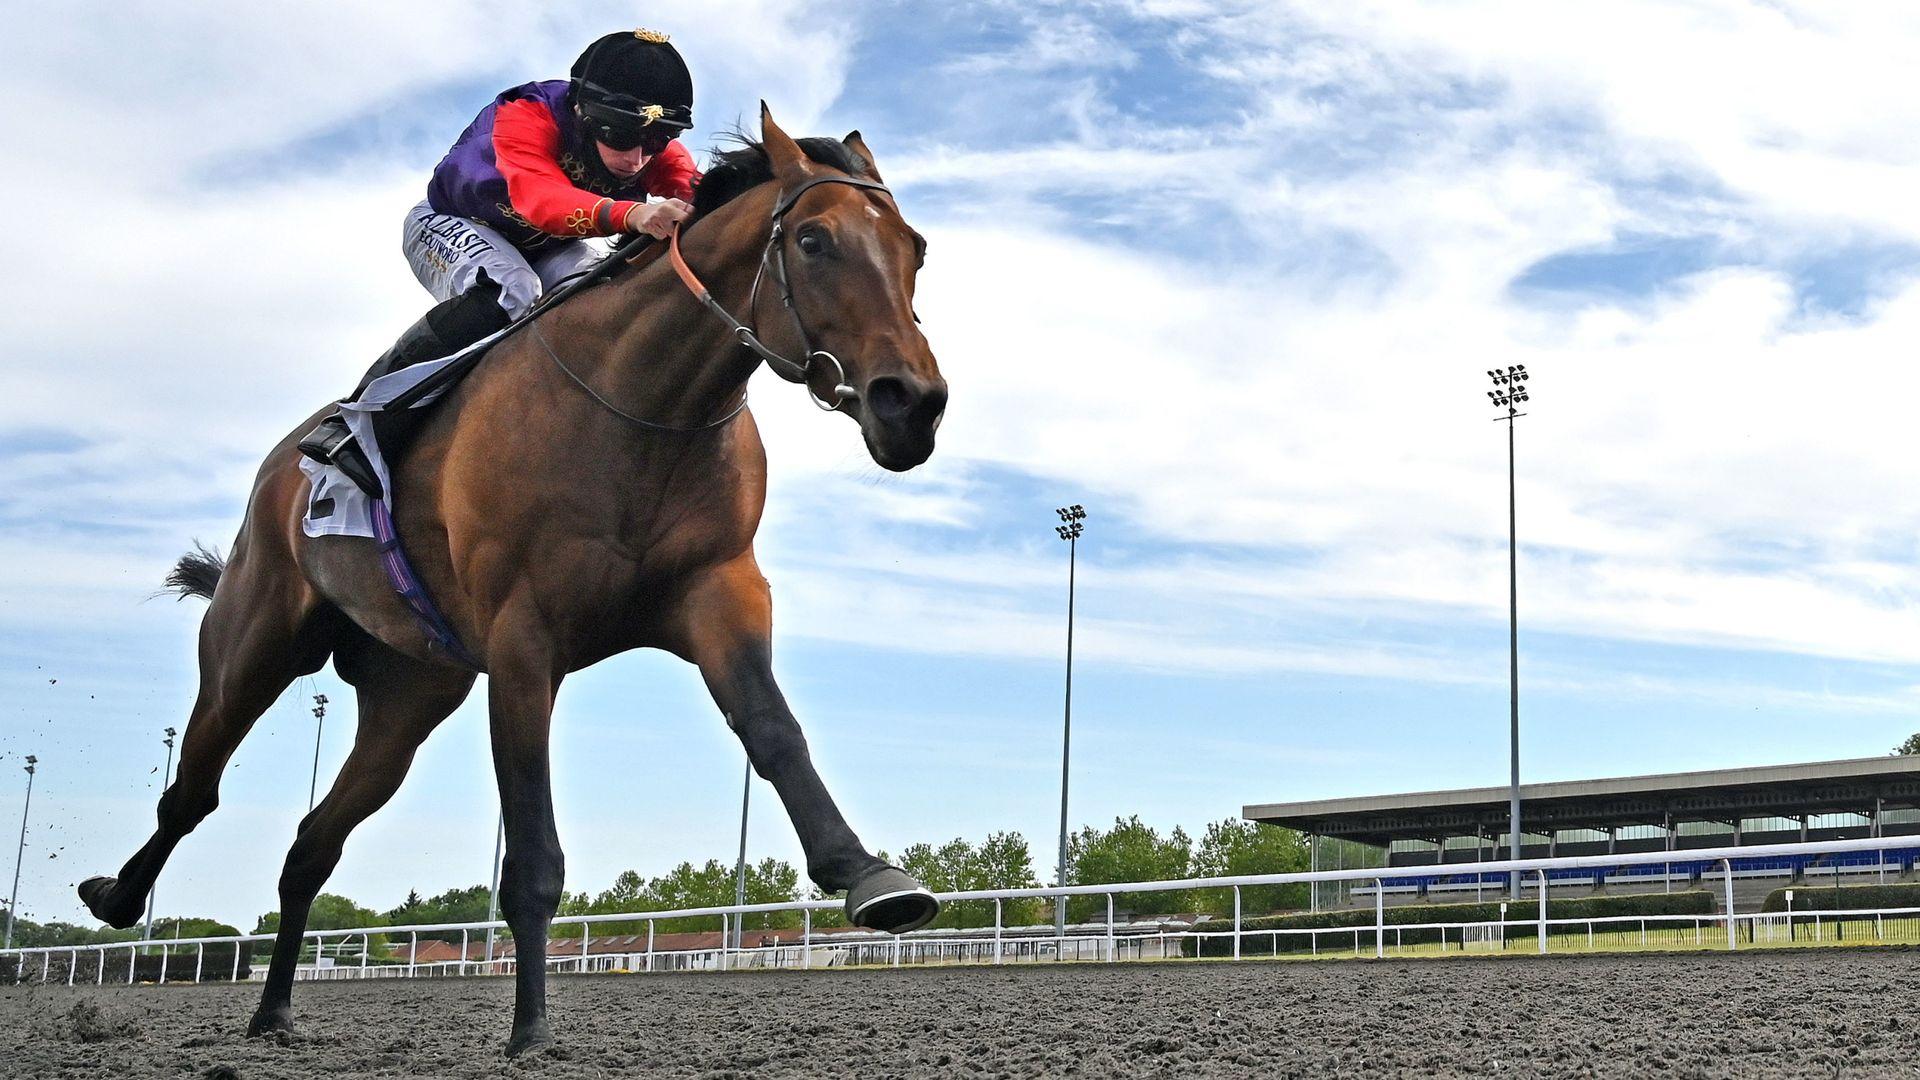 Moore off mark at Kempton - sky sports